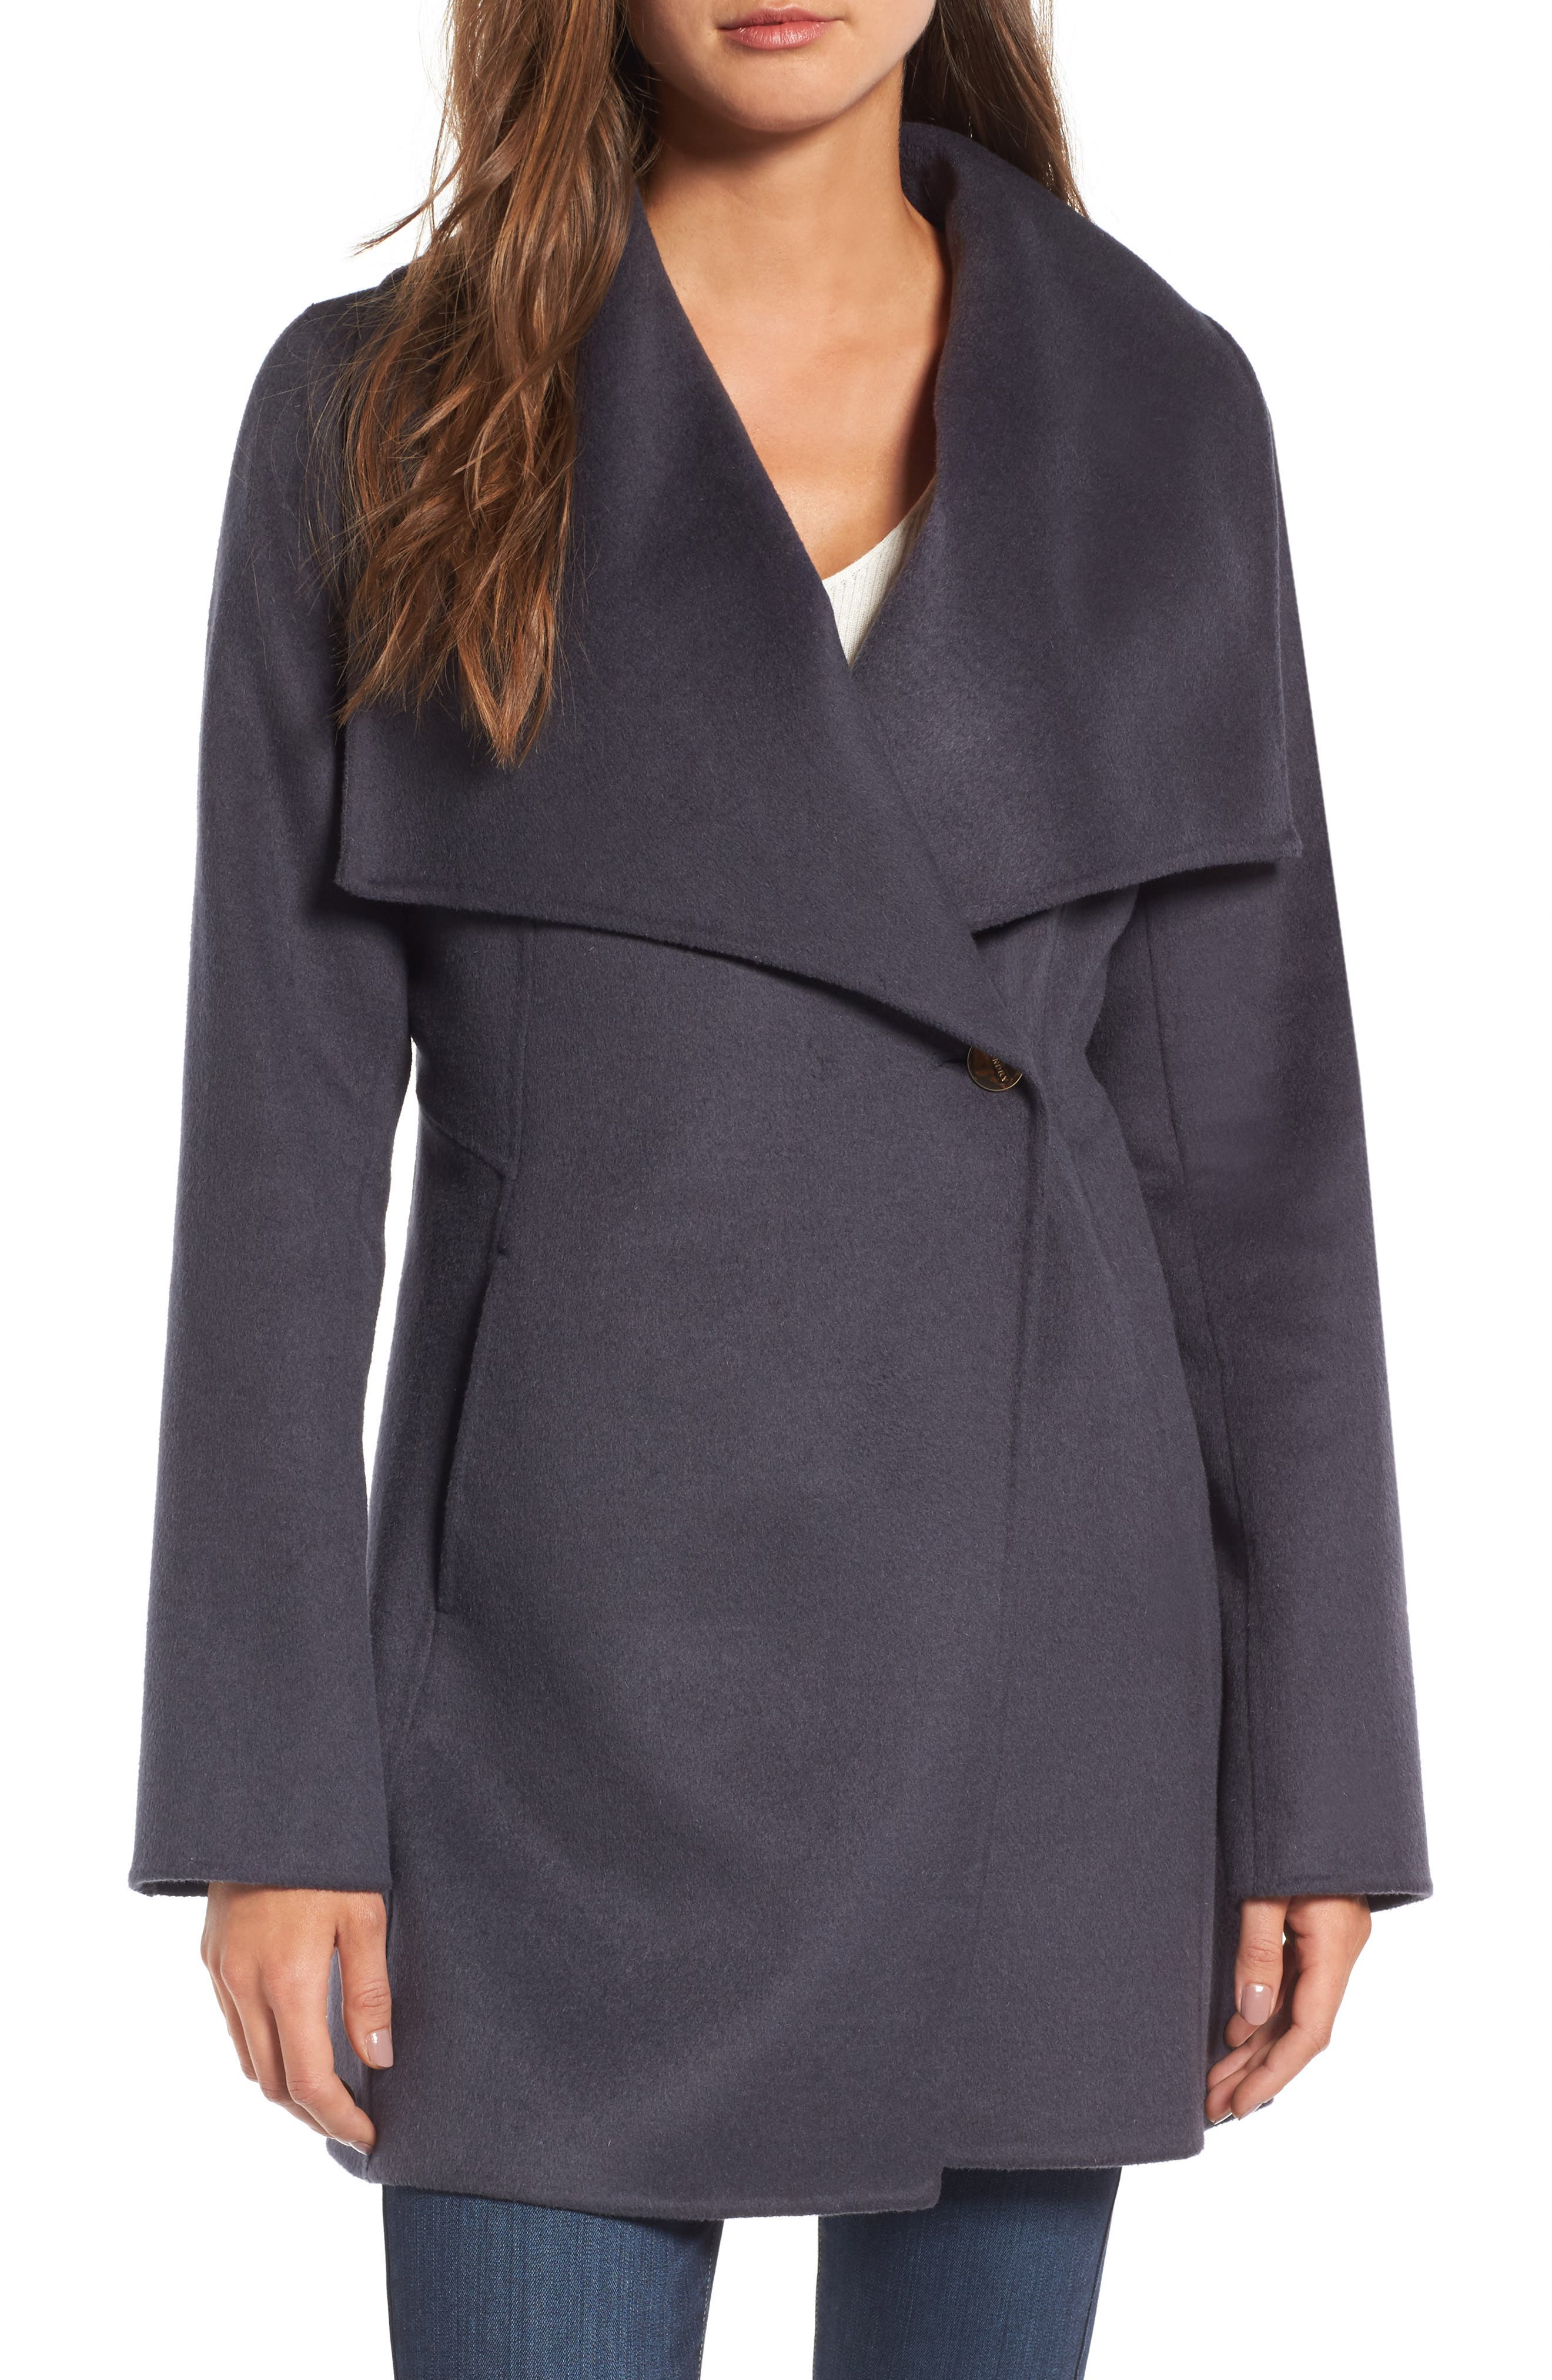 Laundry by Shelli Segal Double Face Drape Collar Coat